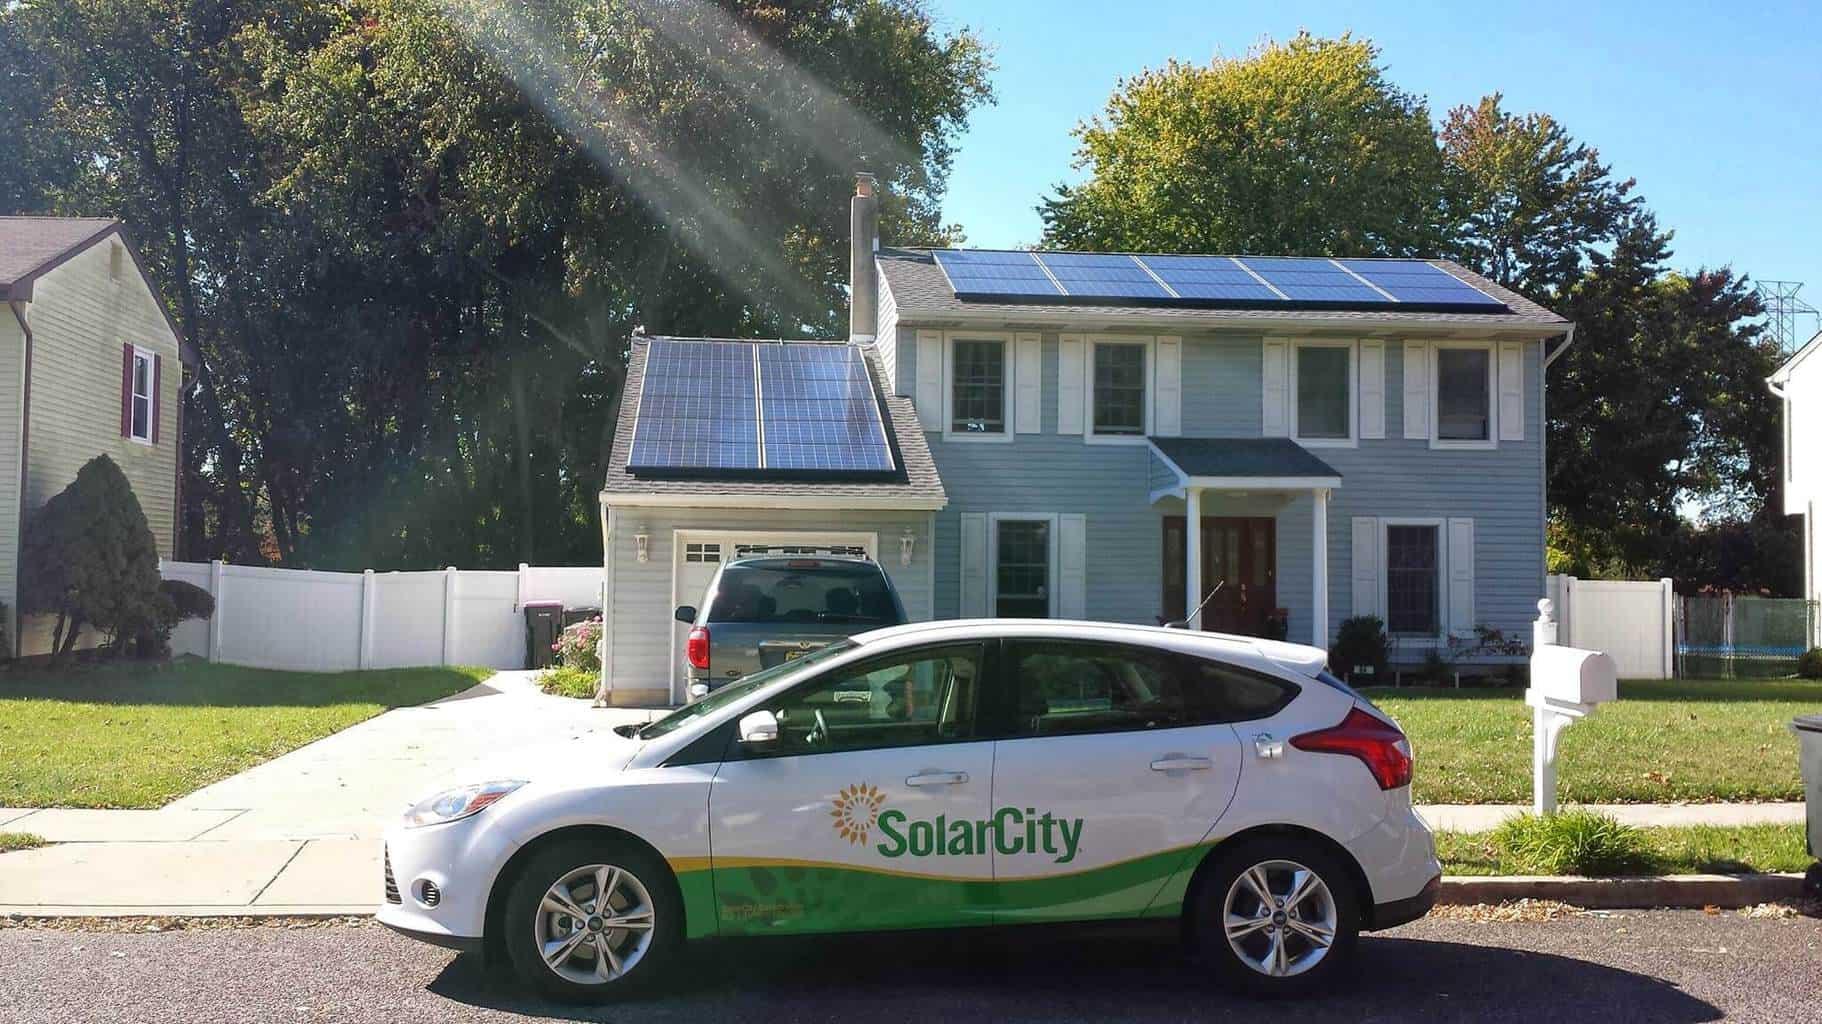 SolarCity Corp (SCTY)